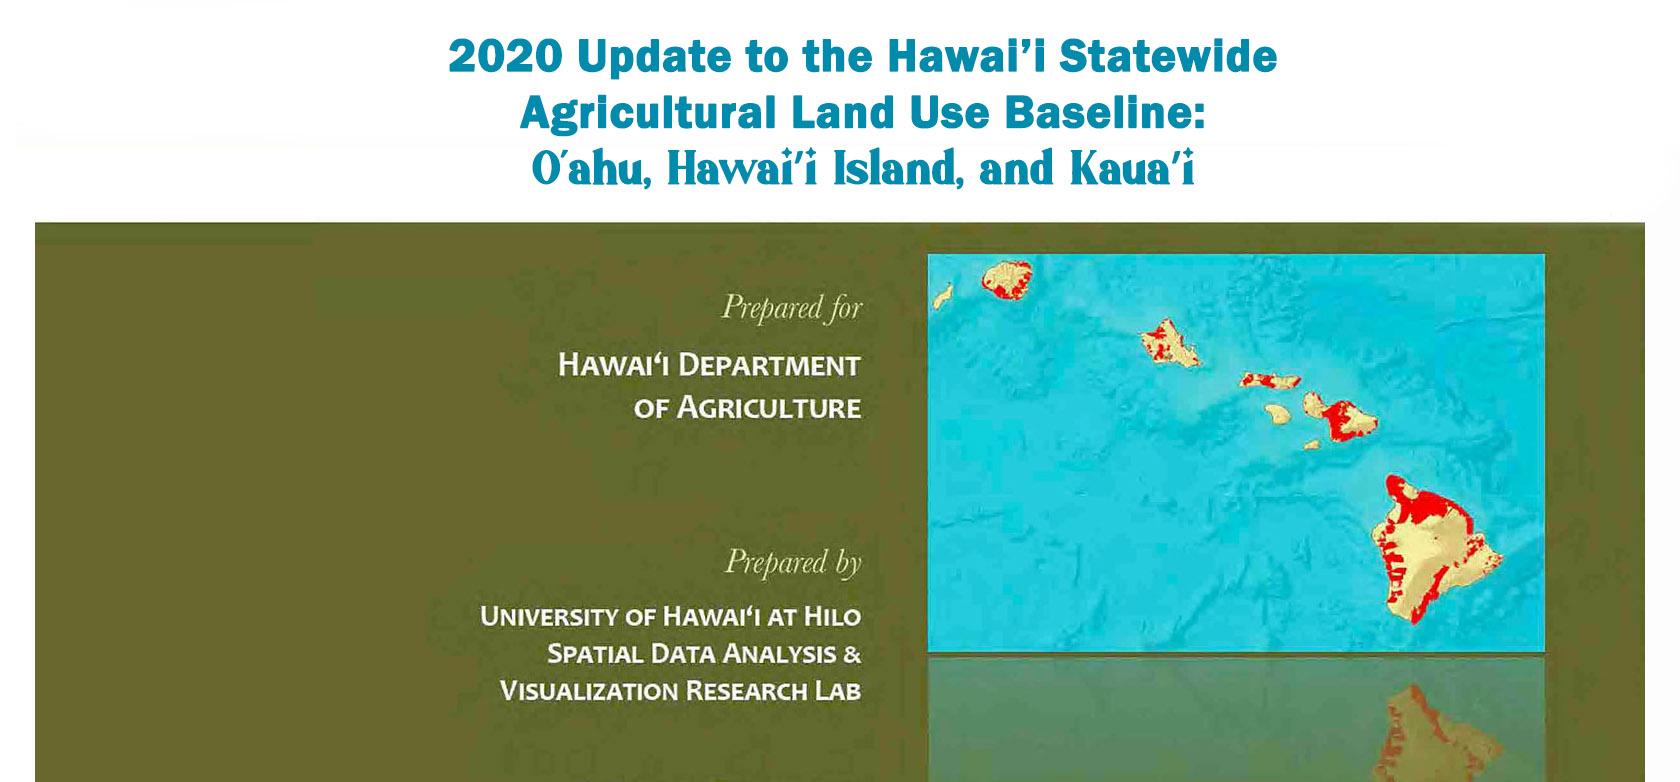 2020 Update to the Hawaiʻi Statewide Agricultural Land Use Baseline: Oʻahu, Hawaiʻi Island, and Kauaʻi